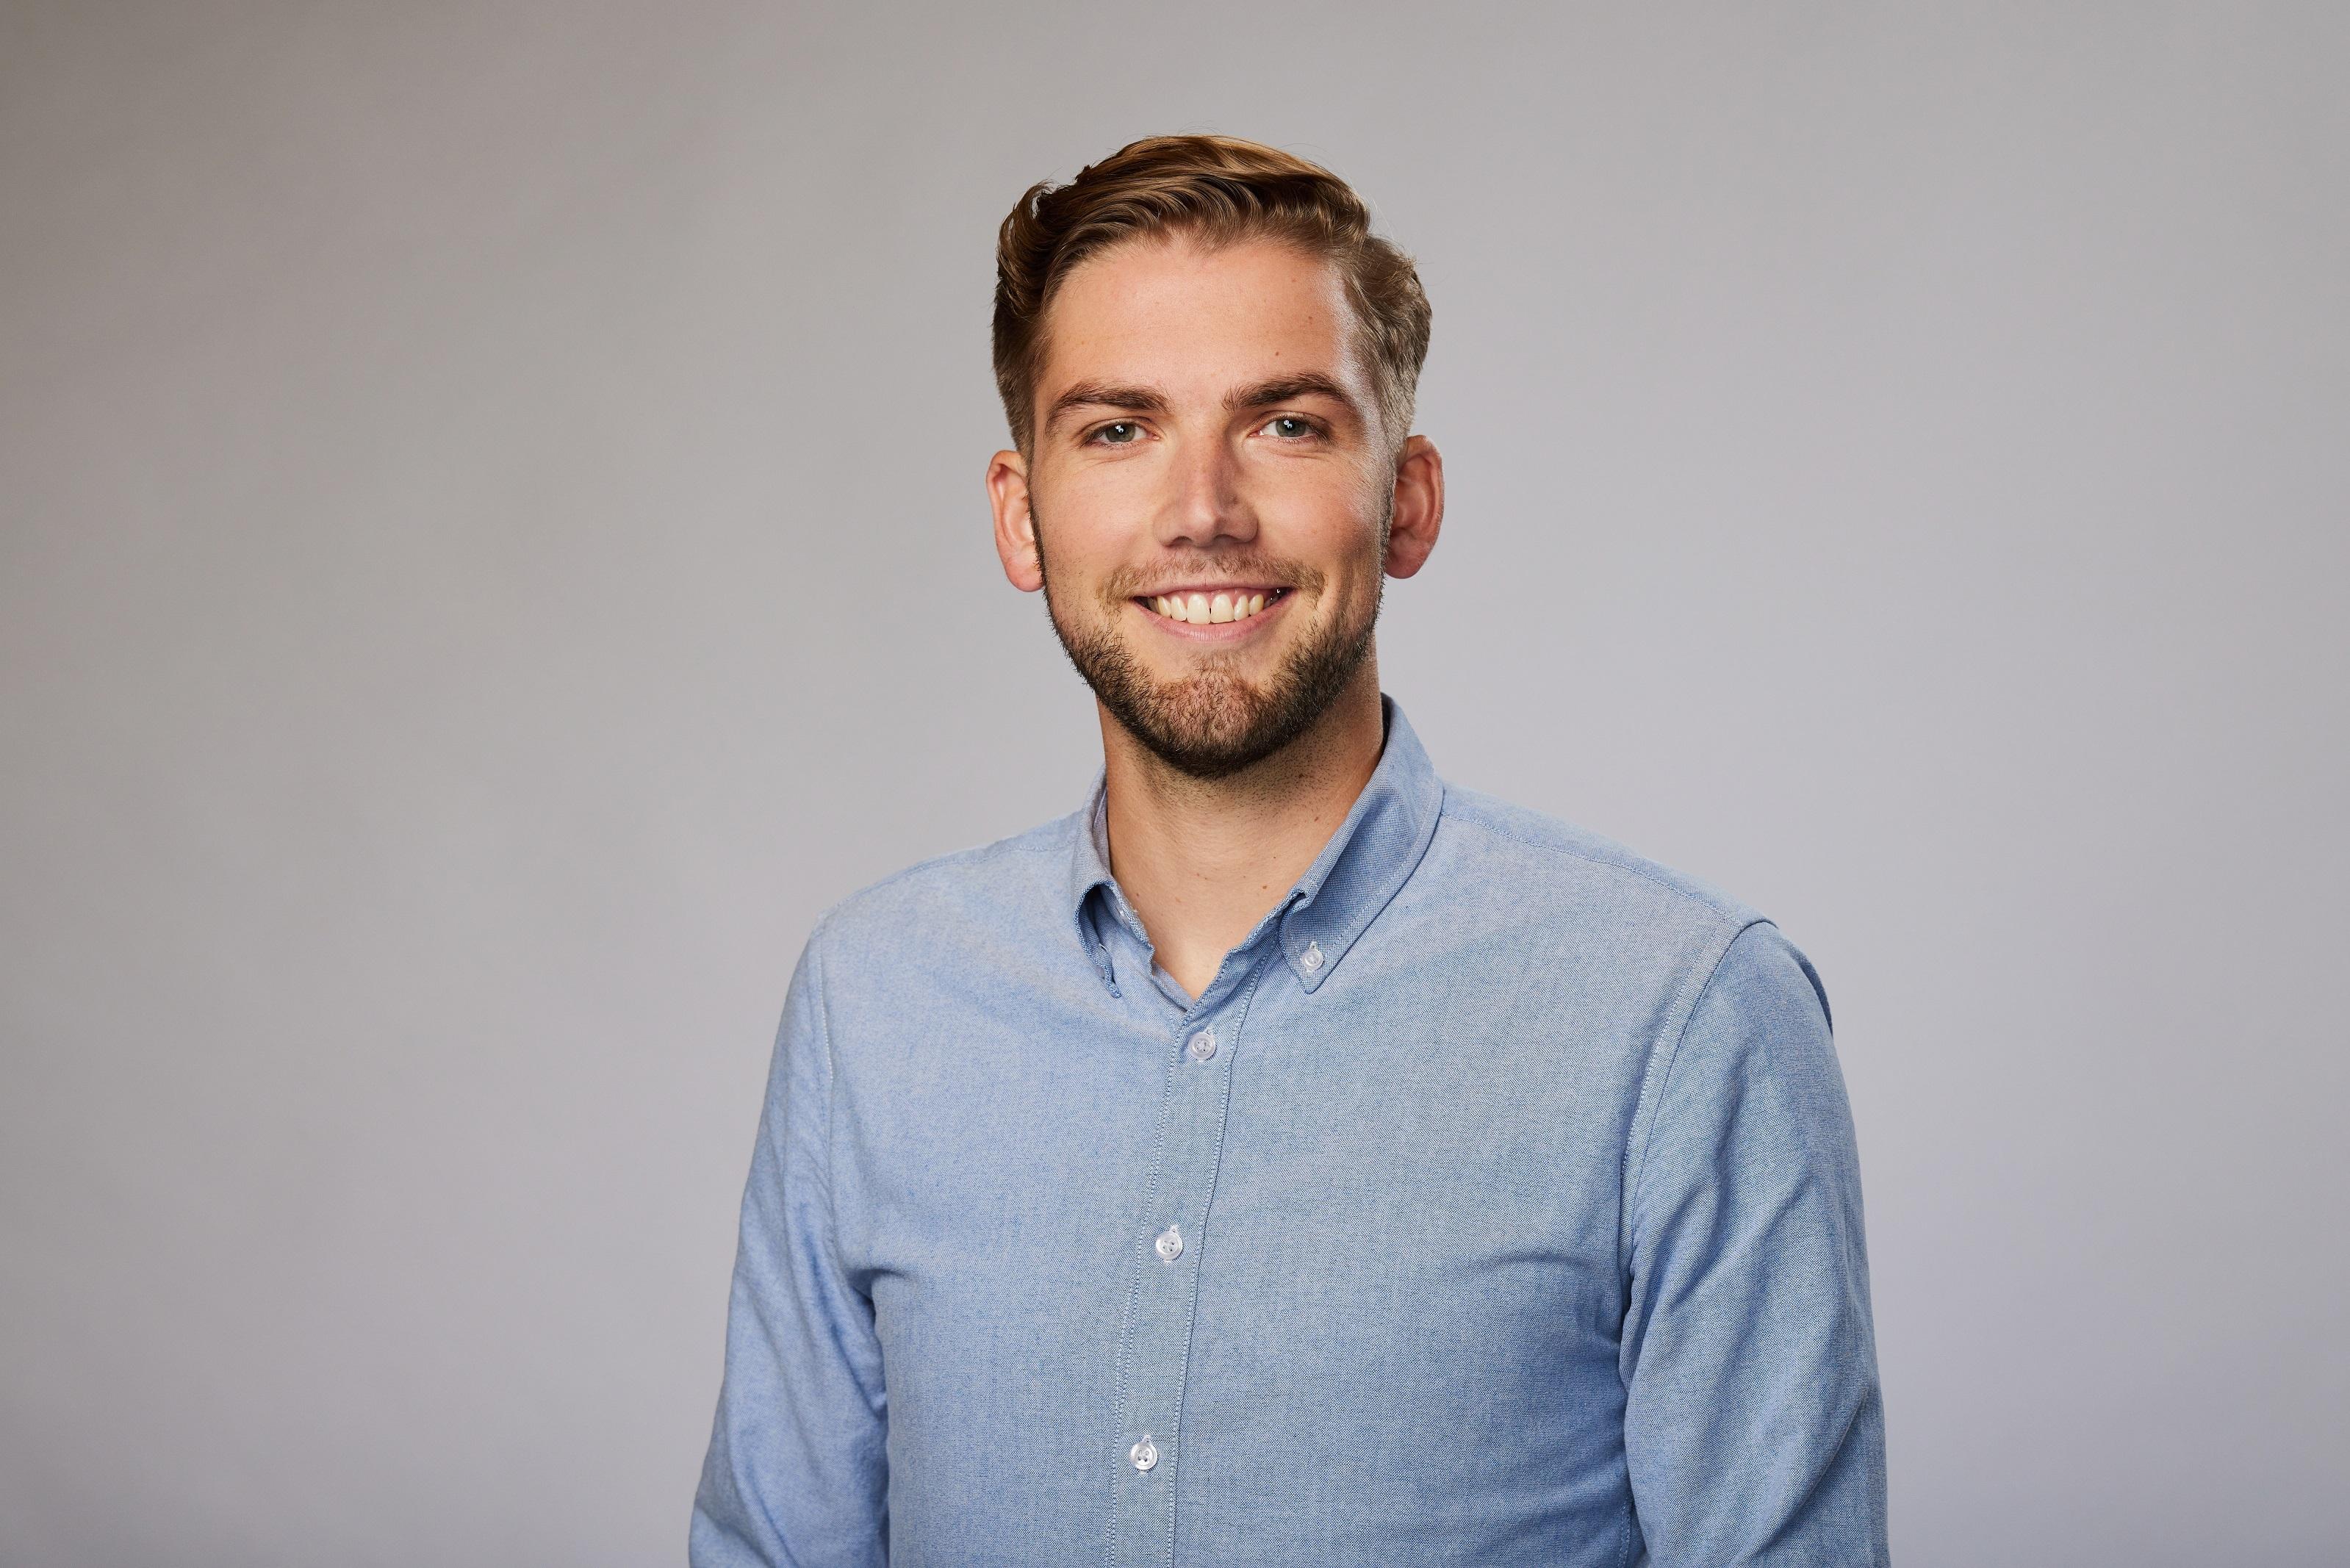 Niels Timmerman